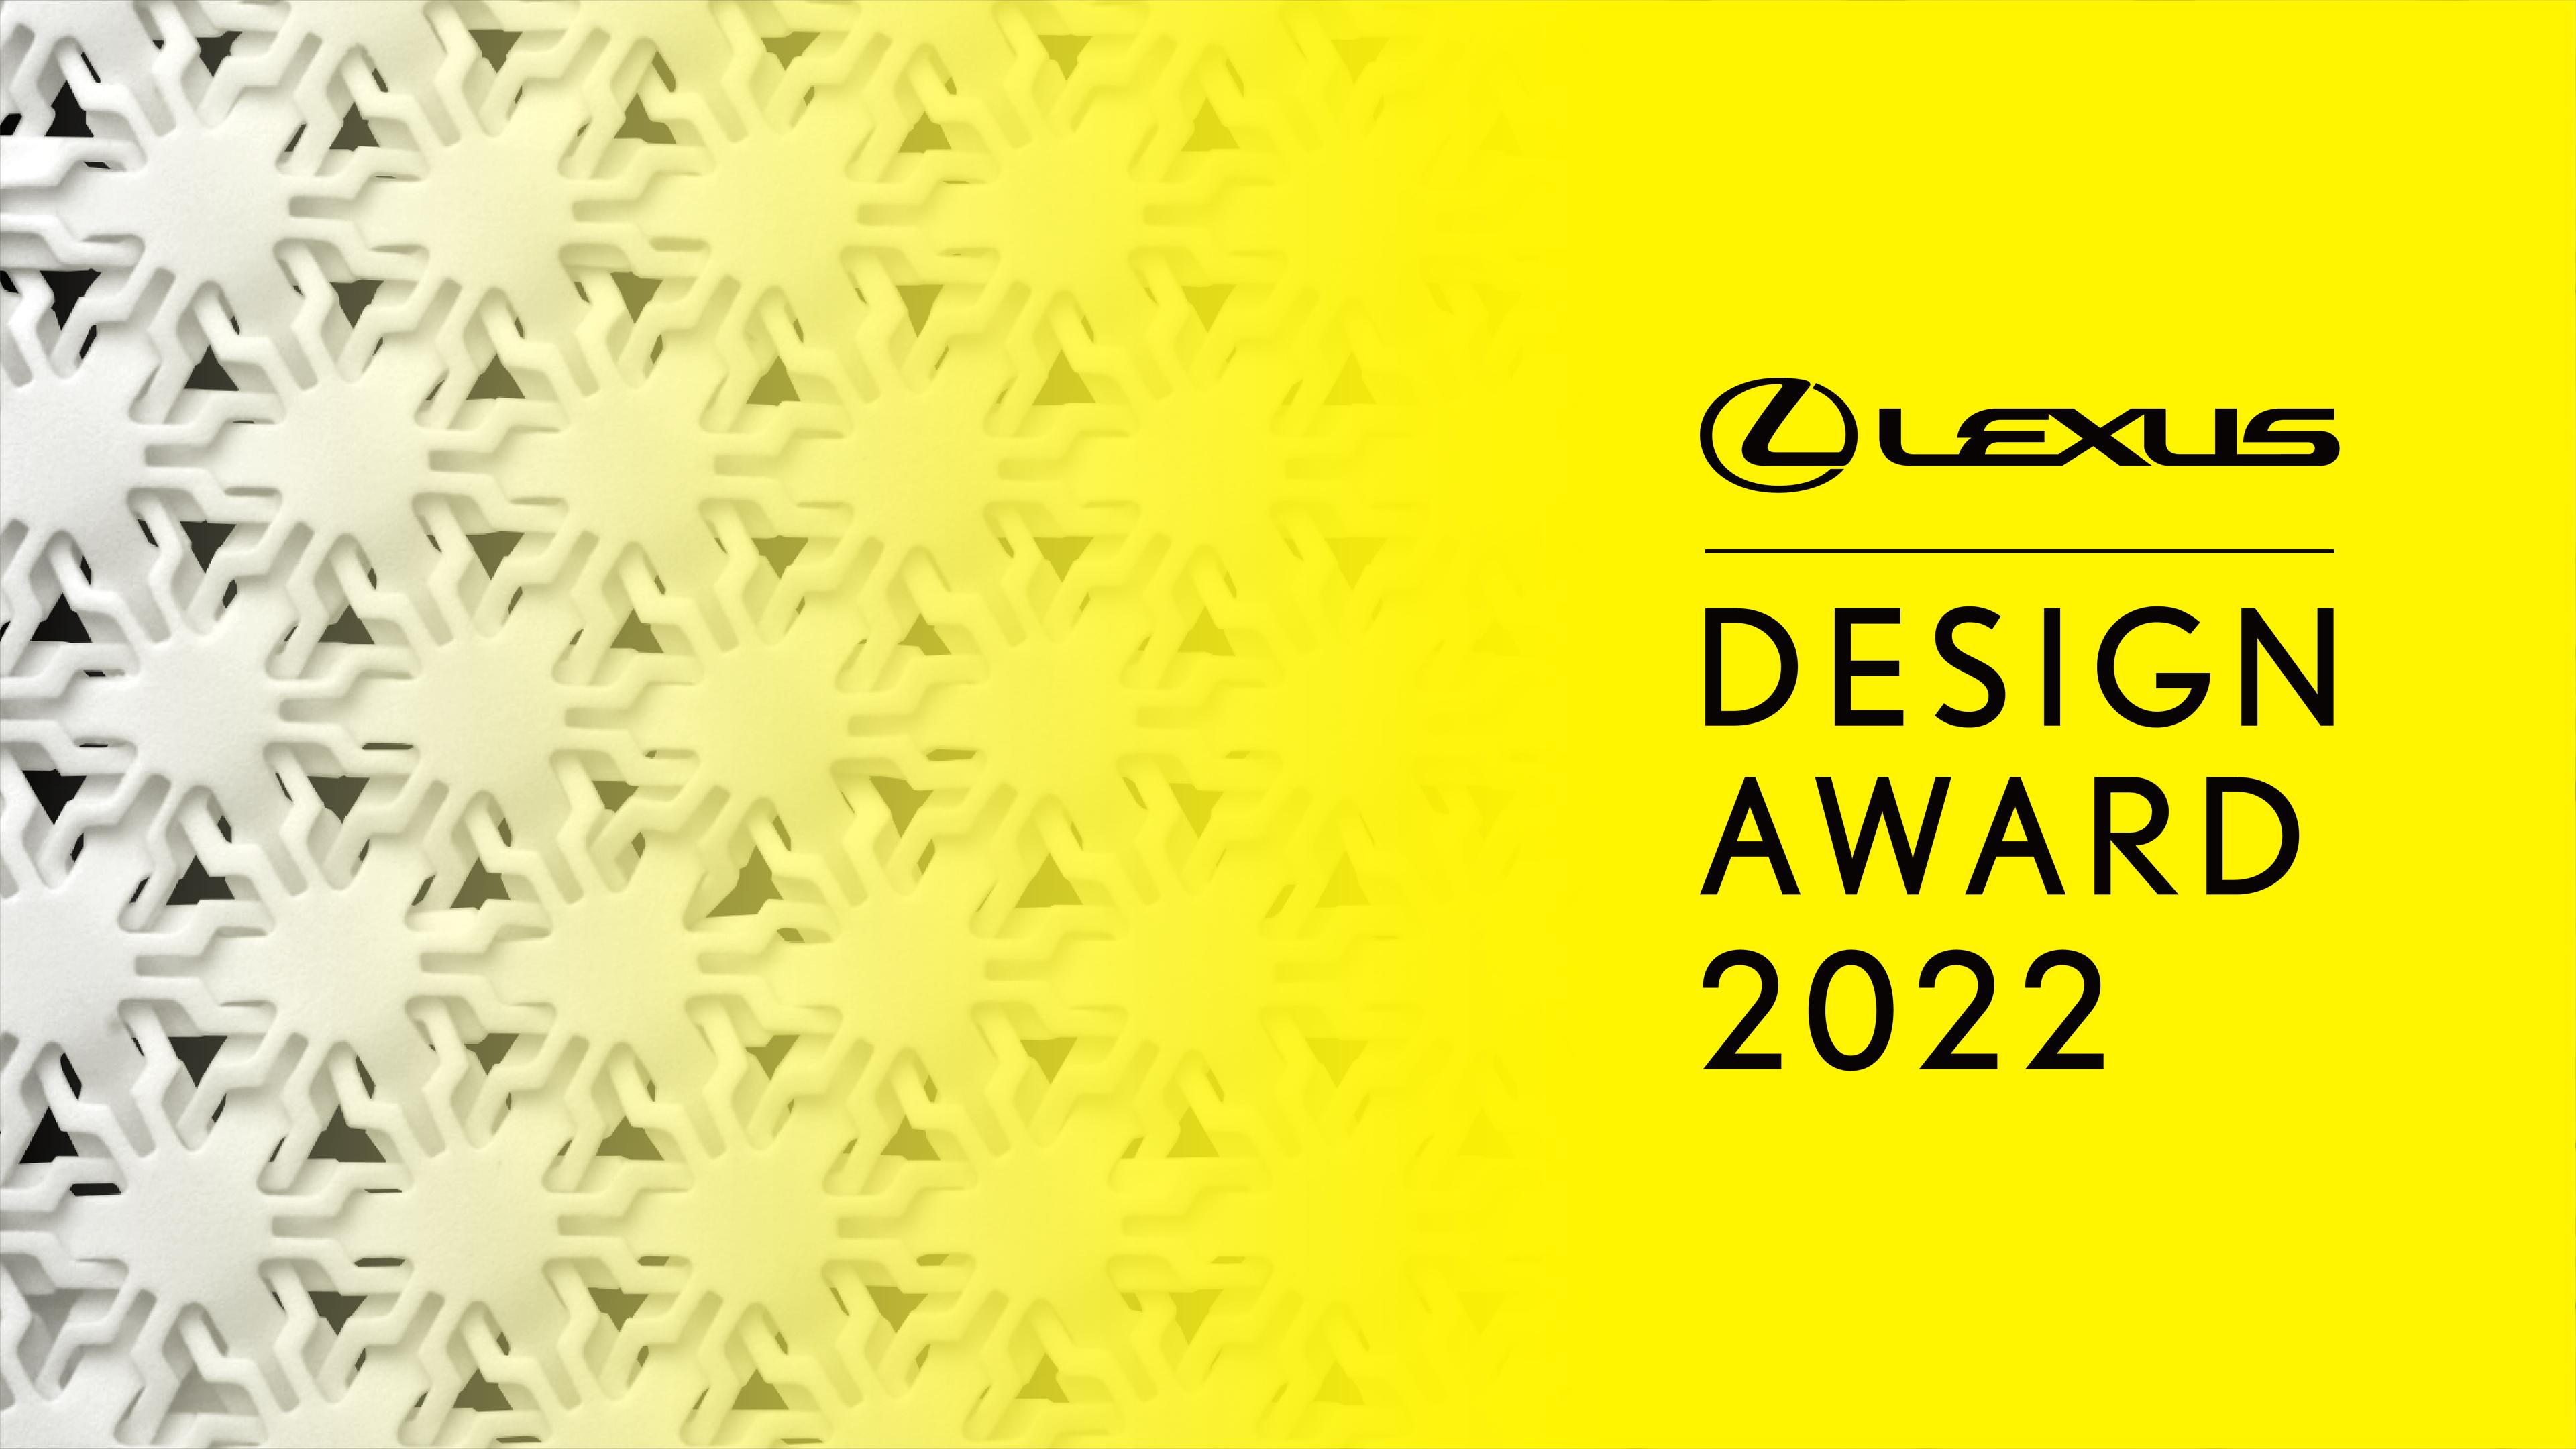 STARTUJE SOUTĚŽ LEXUS DESIGN AWARD 2022